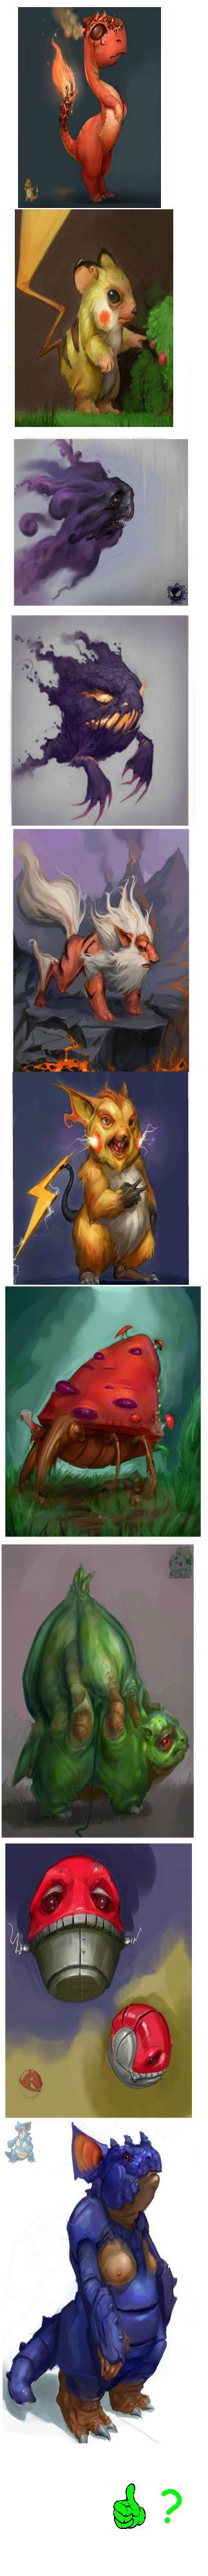 Pokemon Alt Art. this is not a helpful description..... Pokemon retoast art?